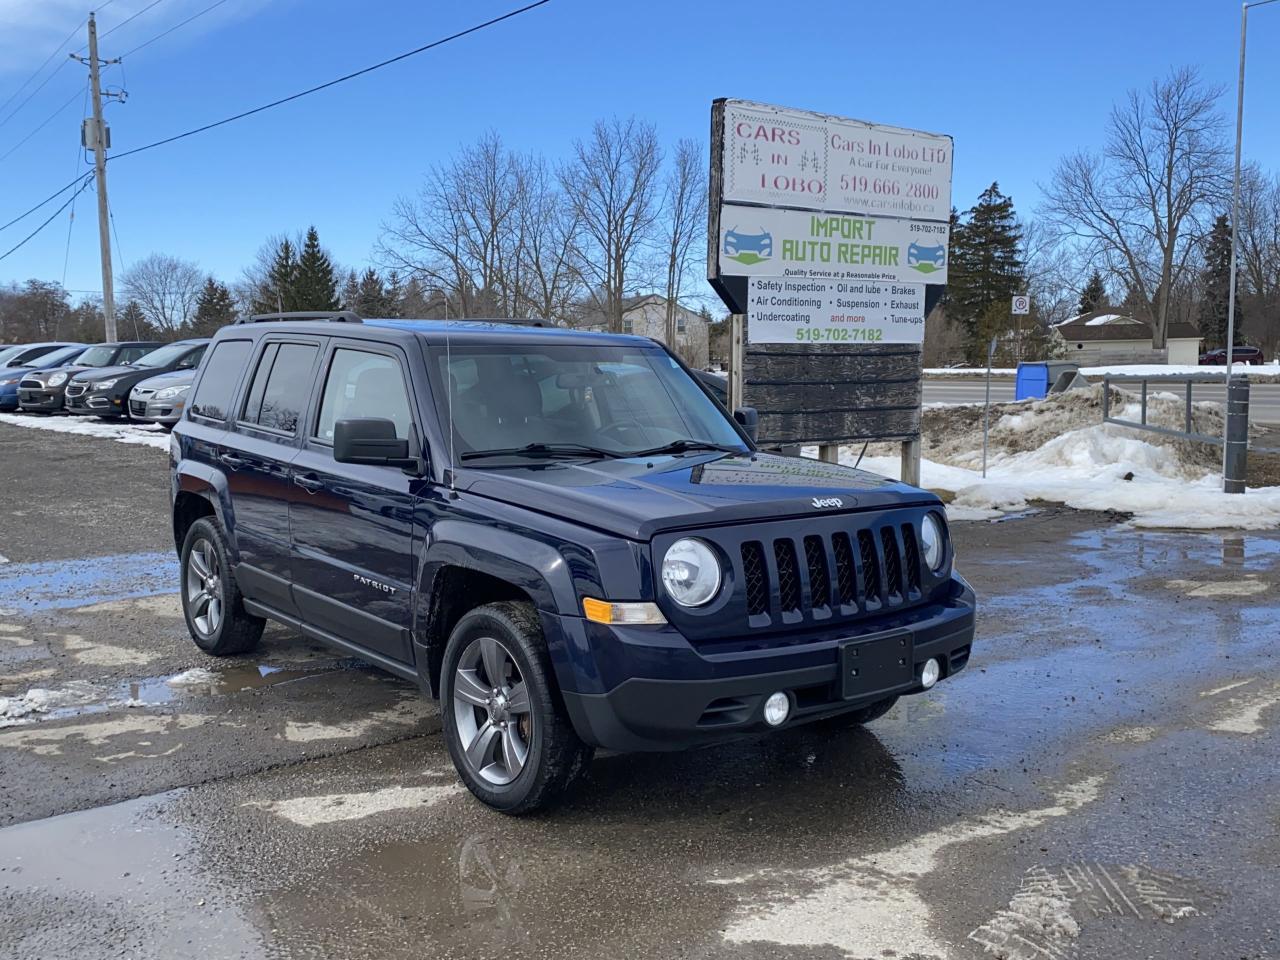 2015 Jeep Patriot High Altitude Leather, heated seats, Sunroof